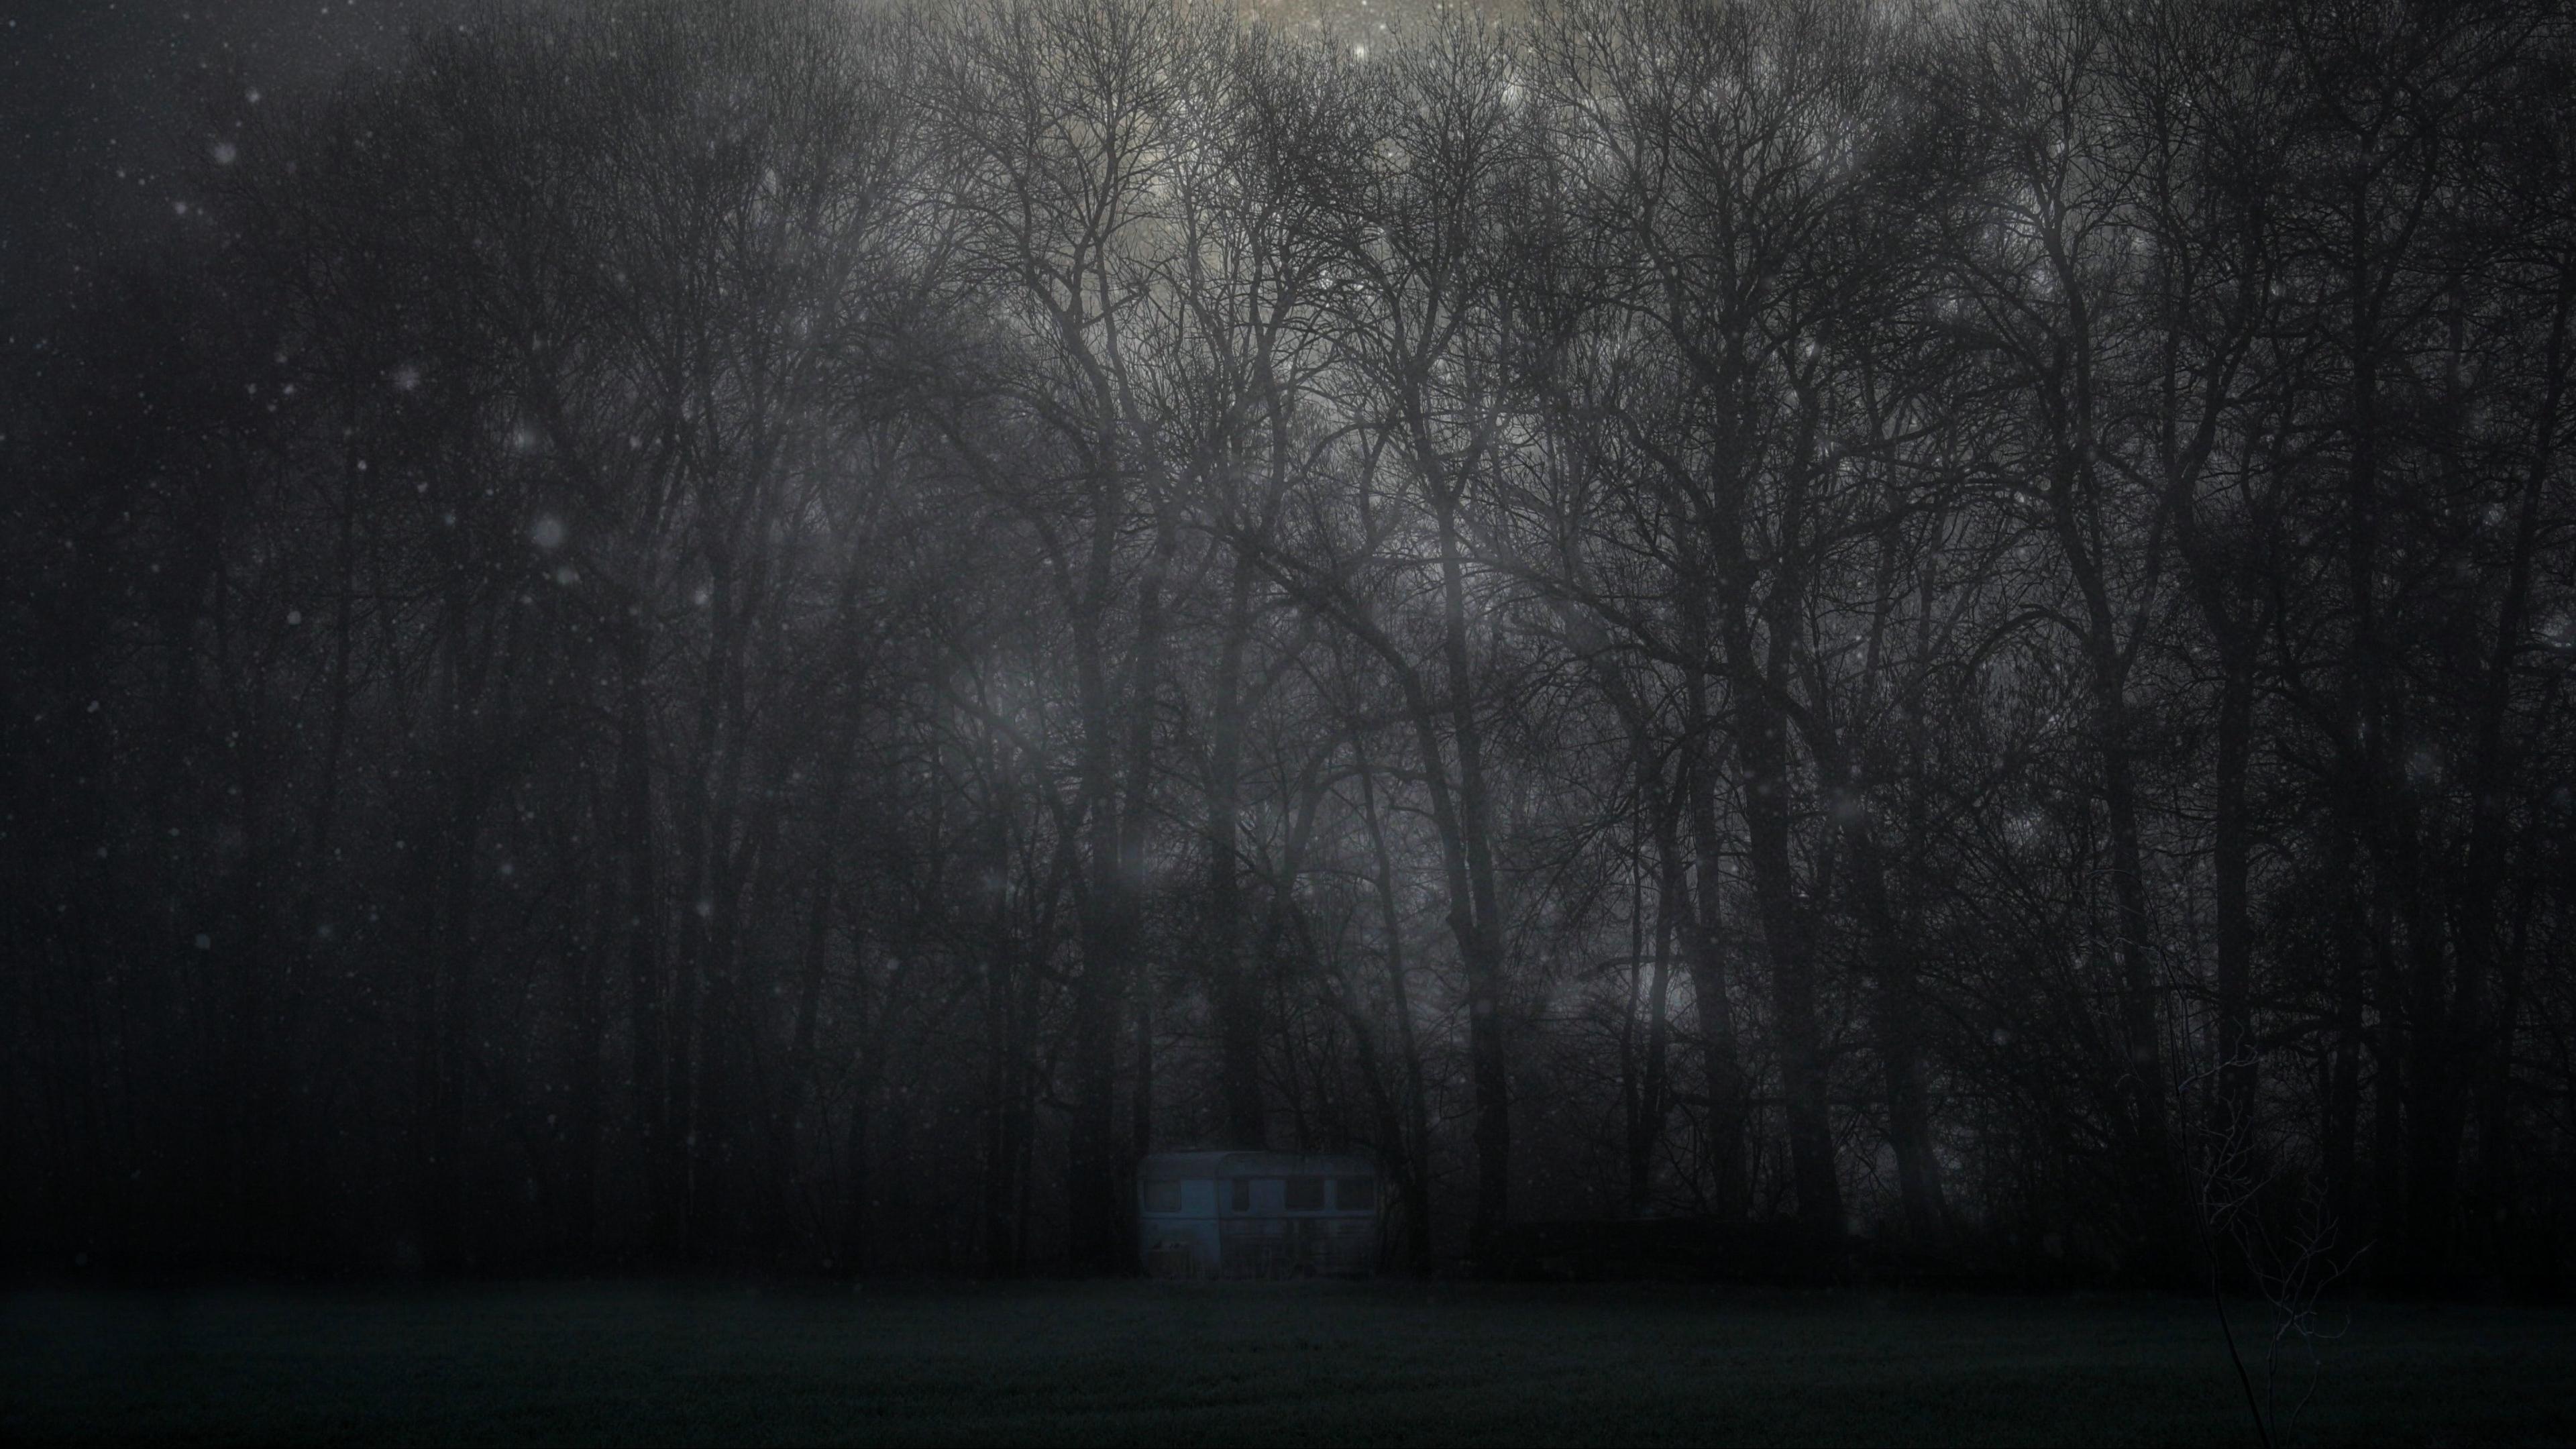 forest mystical fog trees night starry sky 4k 1540575358 - forest, mystical, fog, trees, night, starry sky 4k - Mystical, Forest, fog